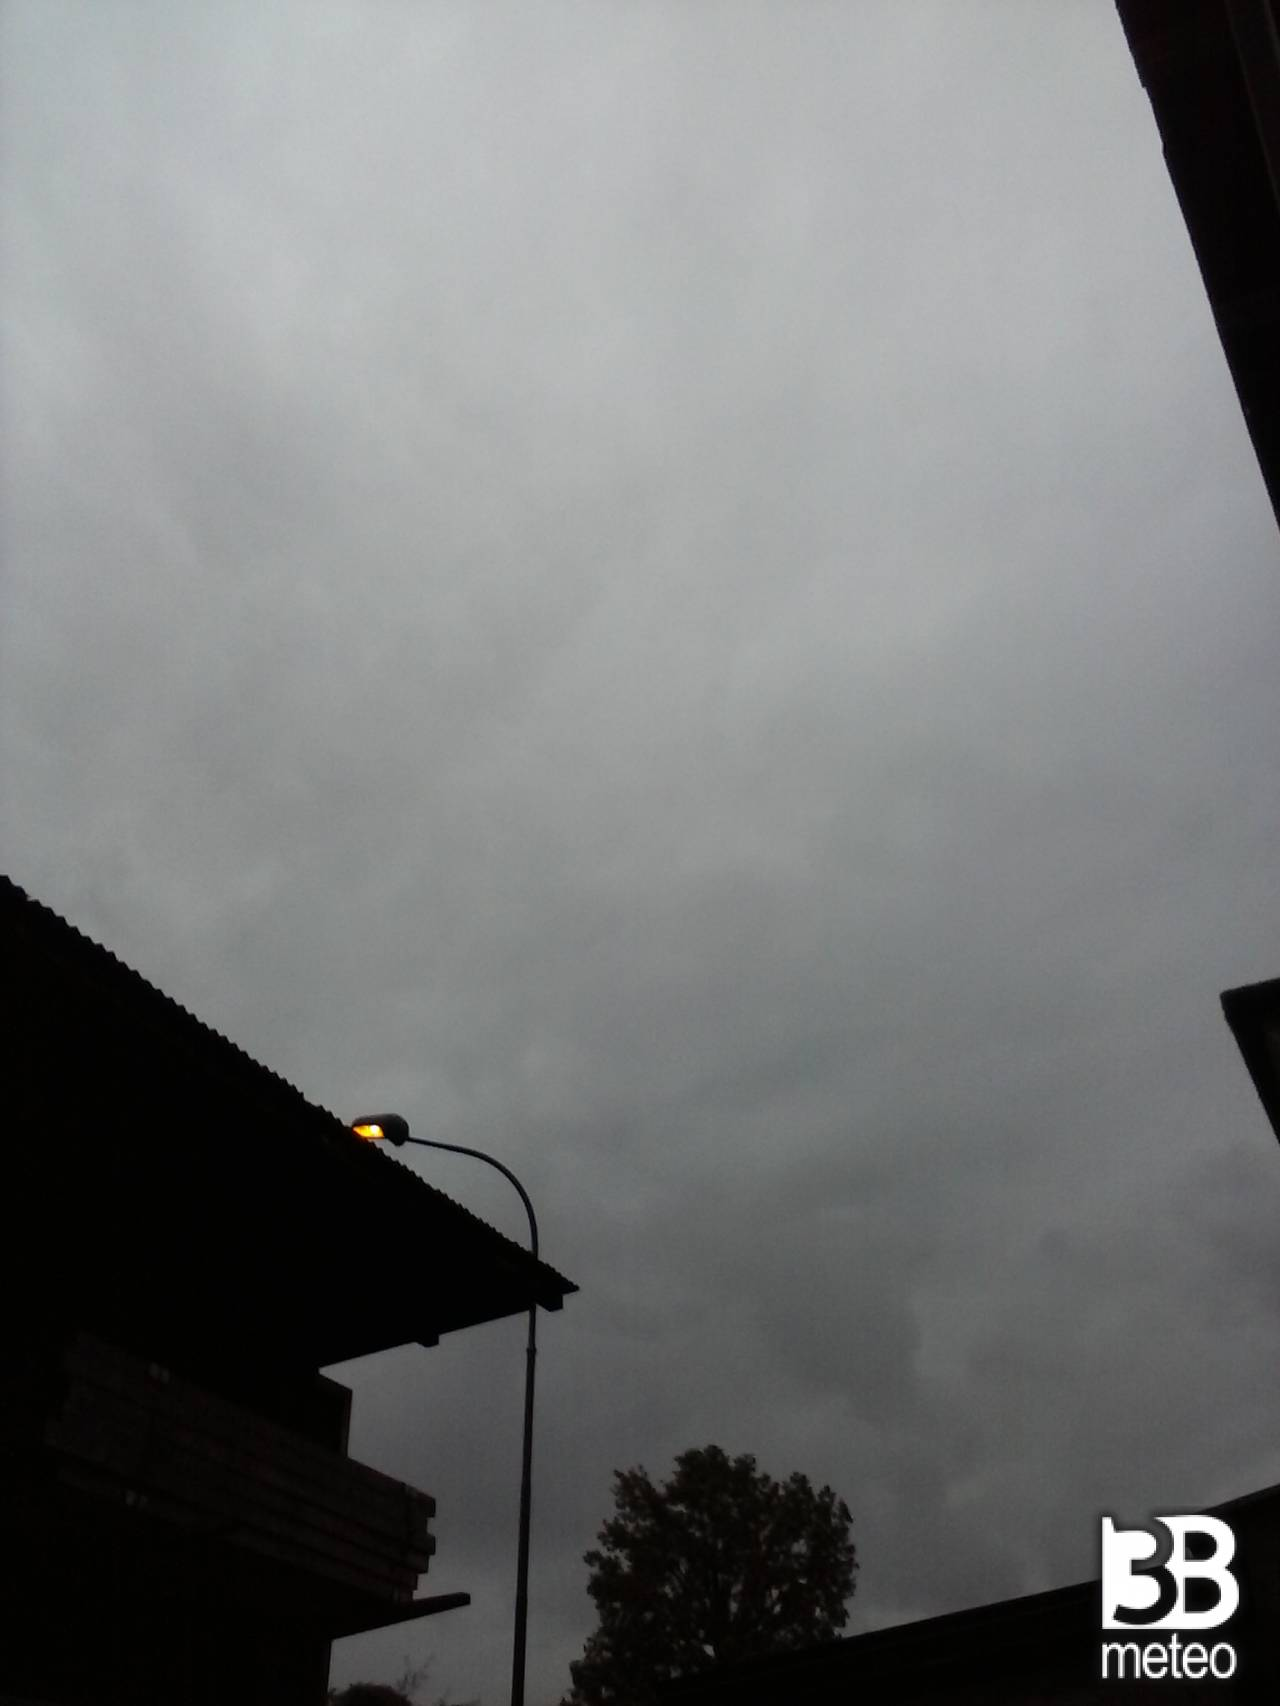 Meteo Piacenza: piogge martedì, molte nubi mercoledì, piogge giovedì - 3bmeteo